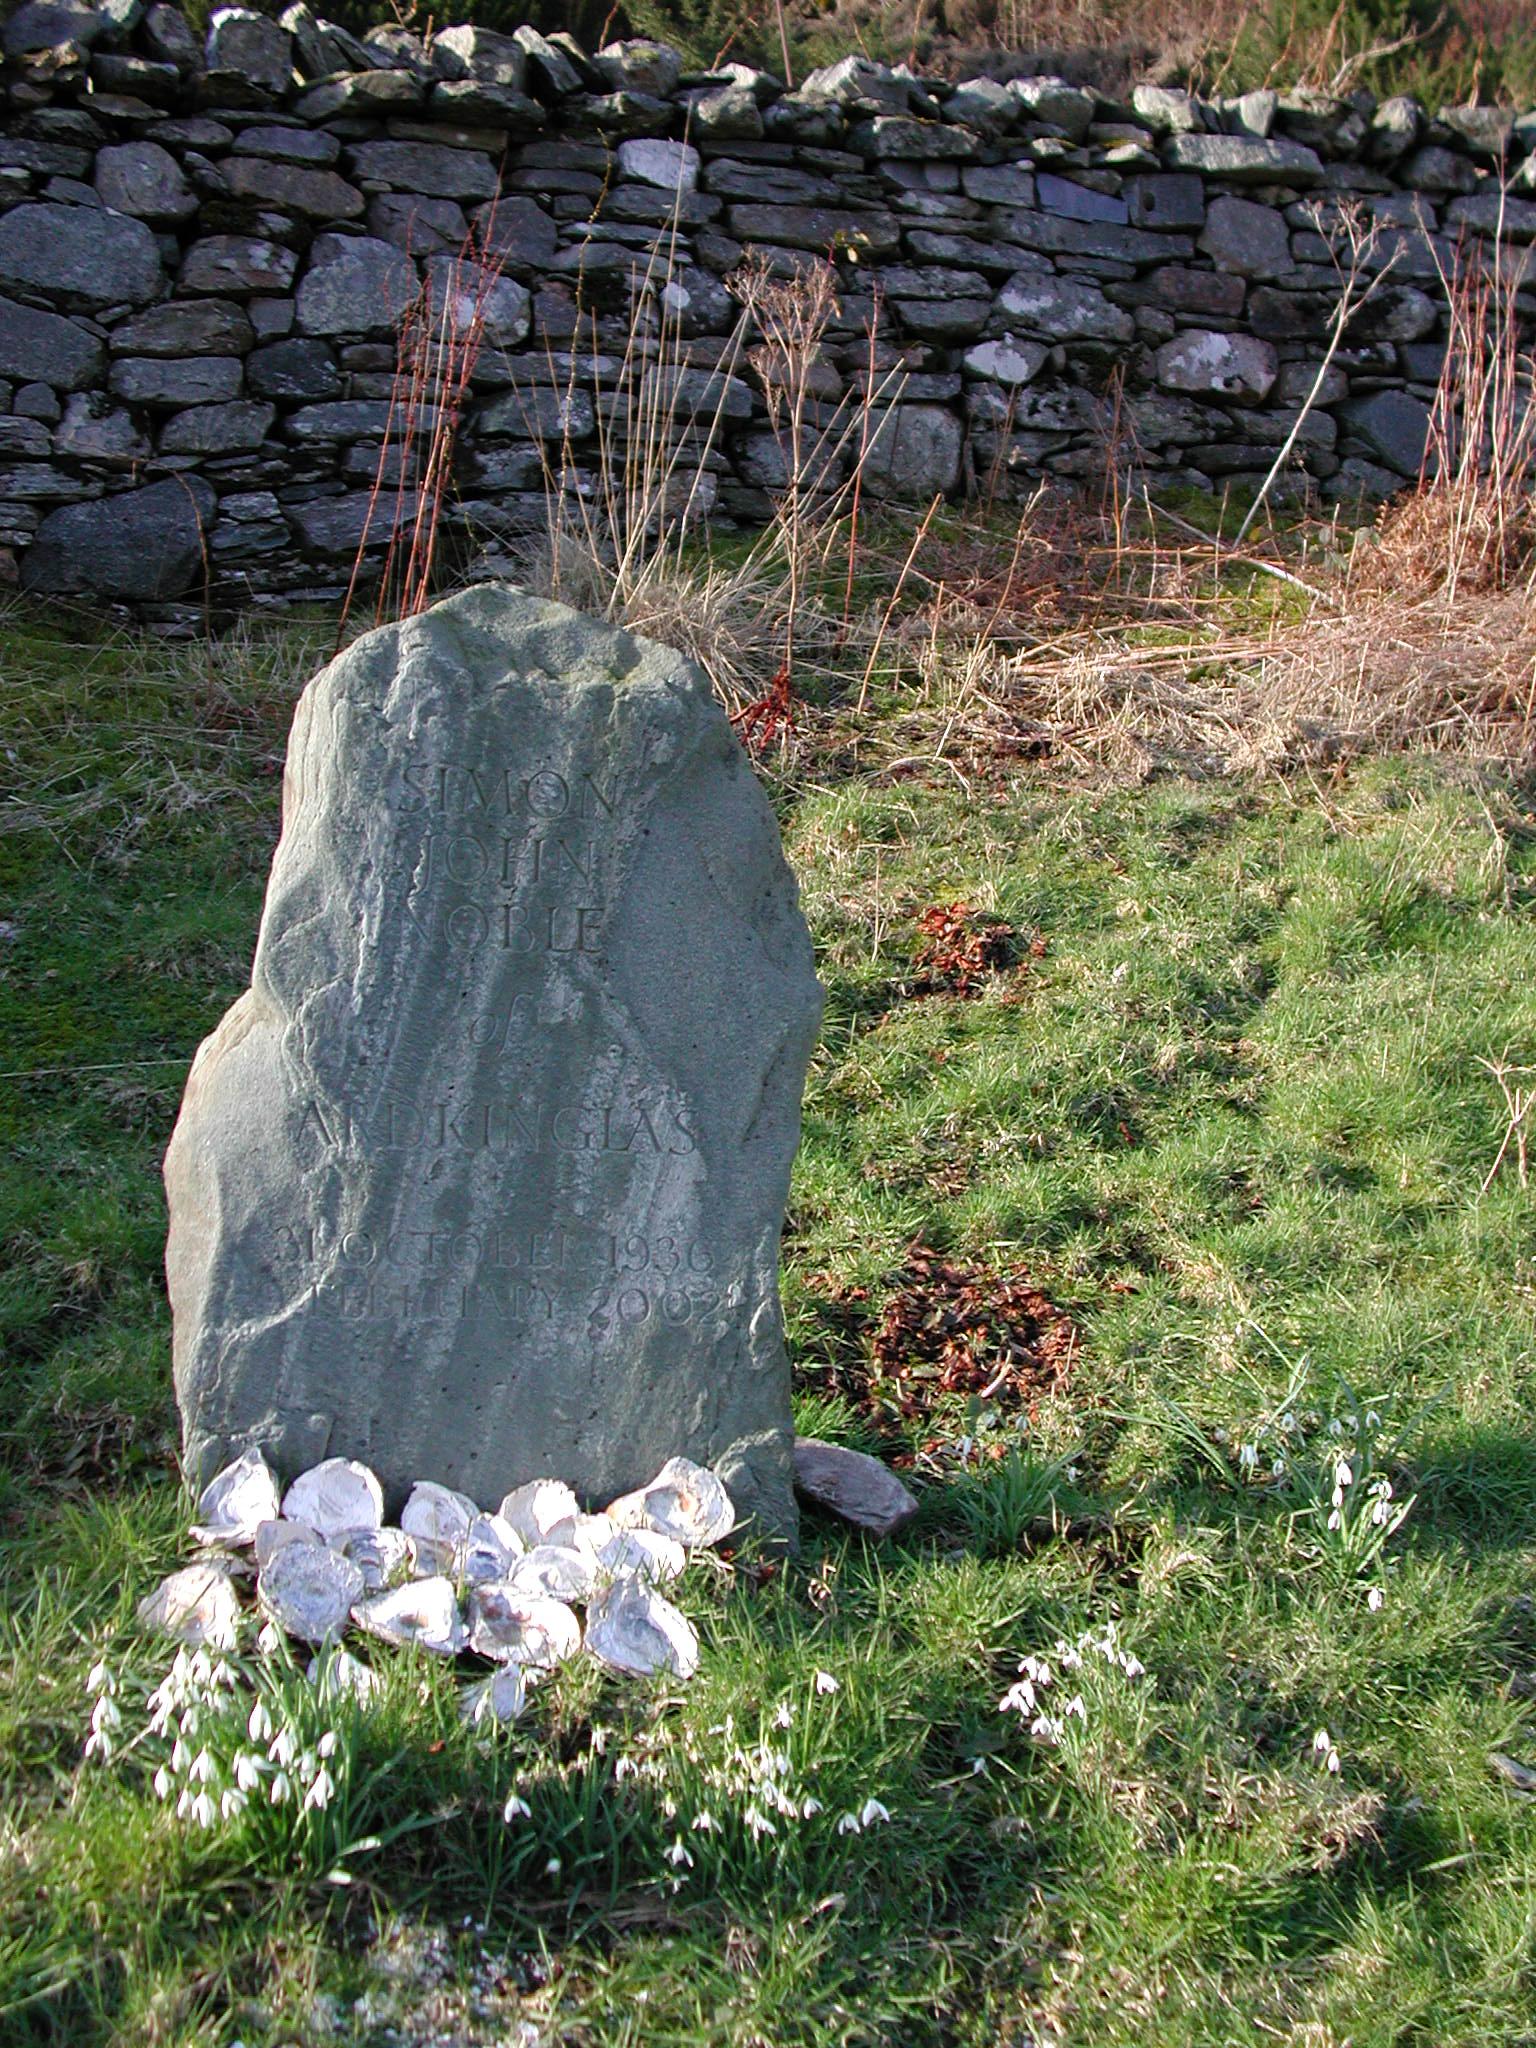 S J Noble's Gravestone